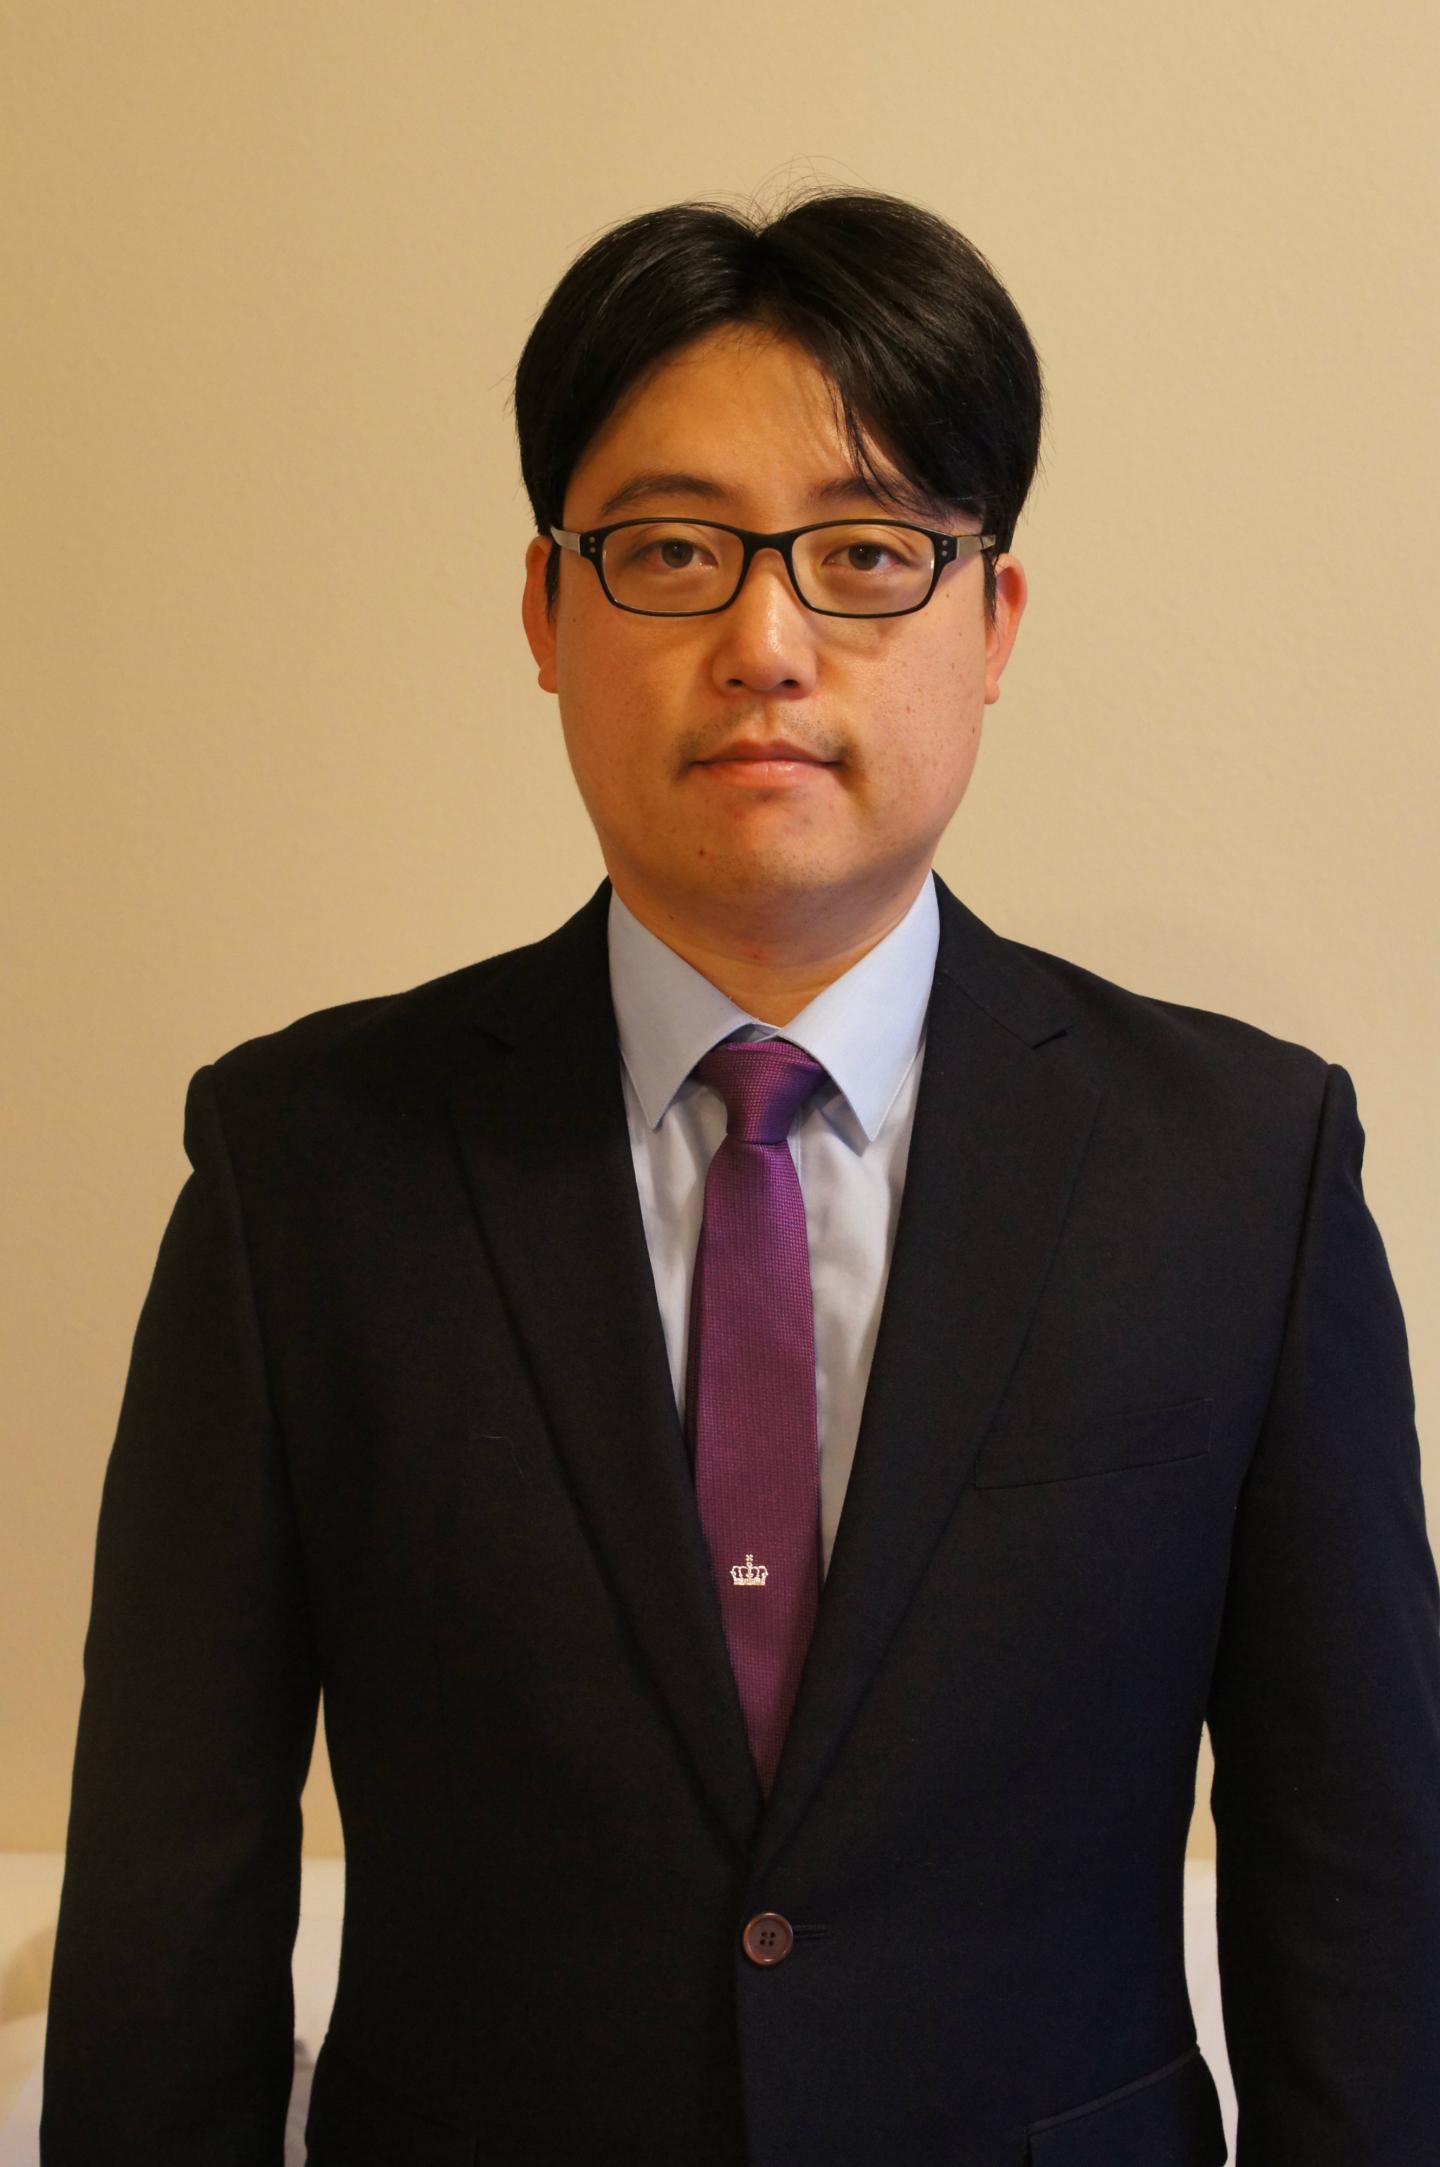 Gene Moo Lee, University of Texas at Arlington